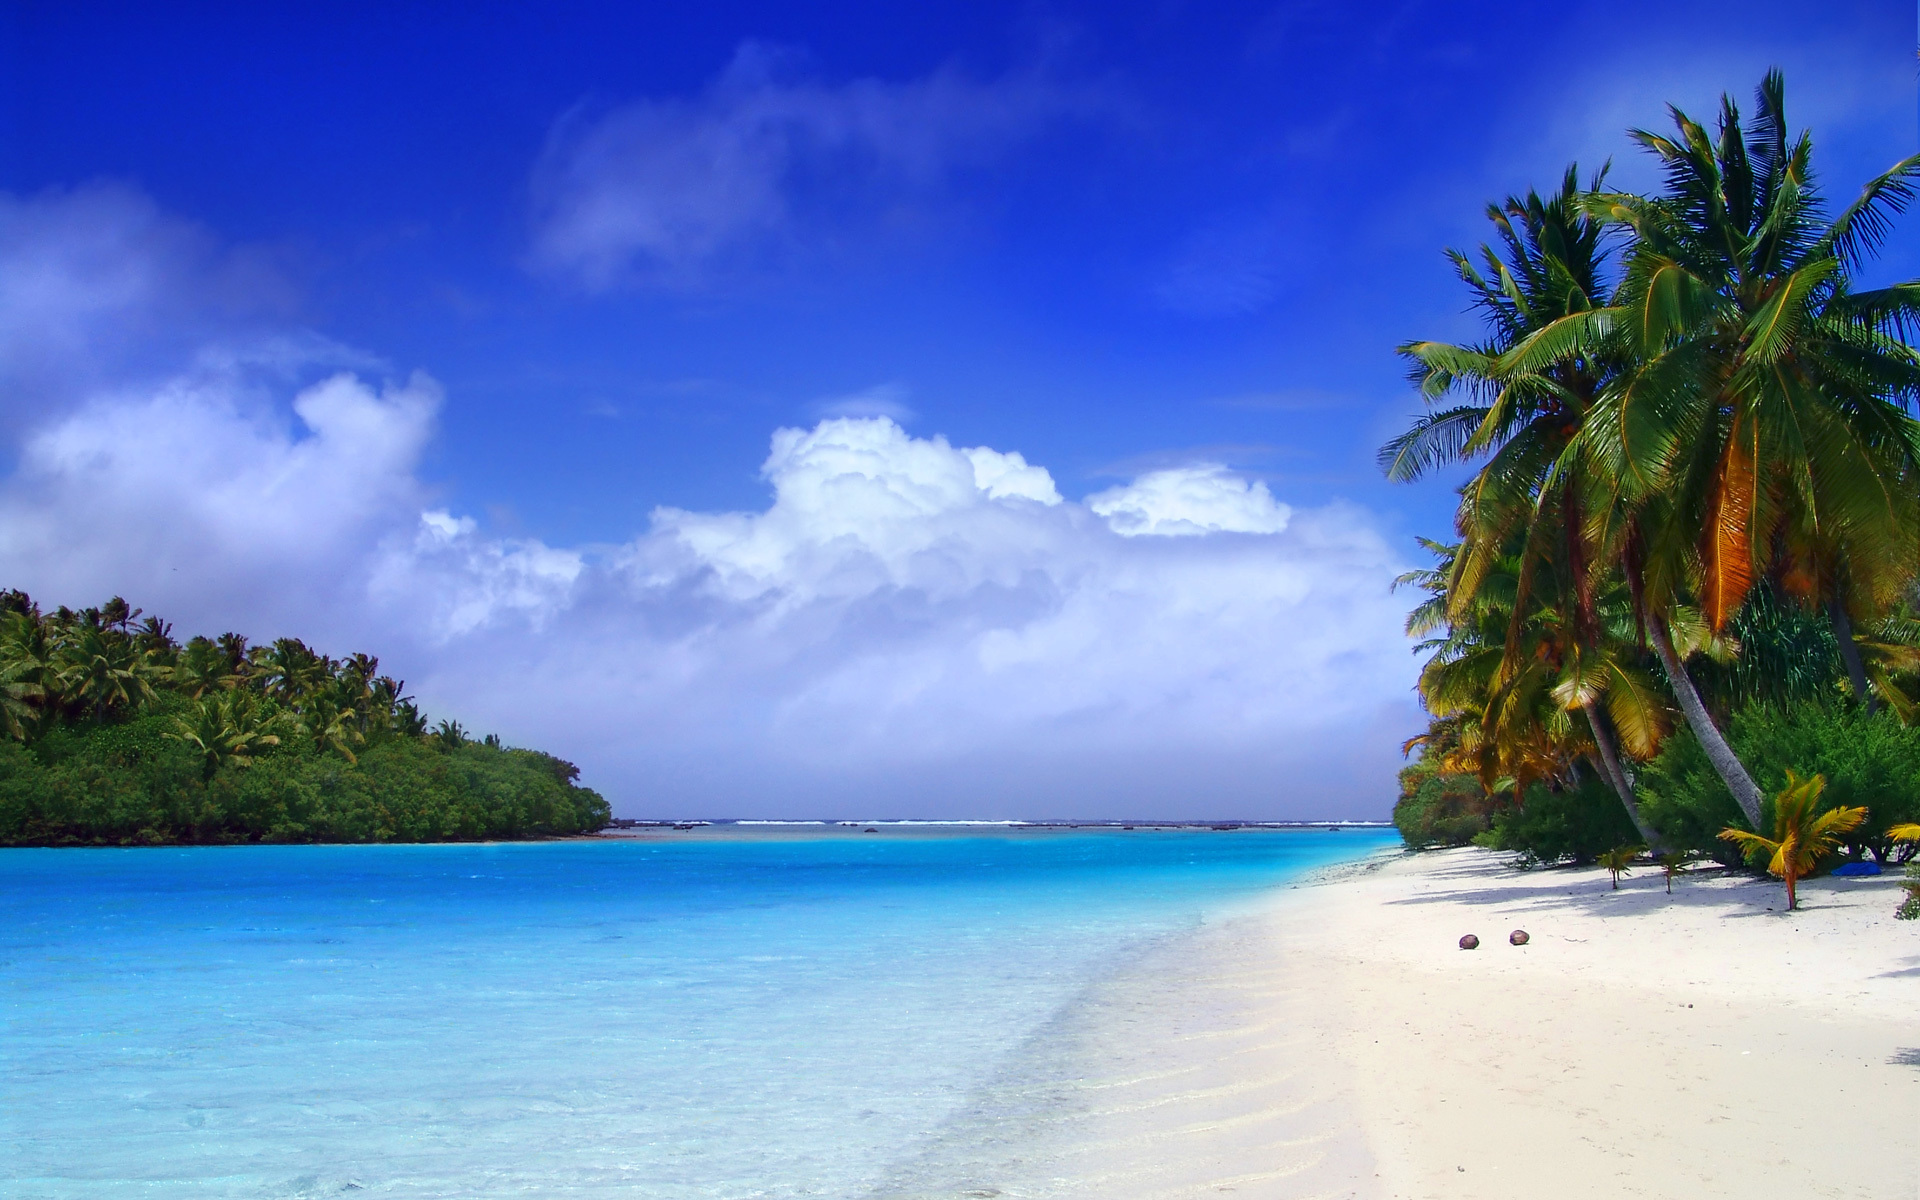 Great Wallpaper Macbook Tropical - paradise-beach-wallpaper-1920x1200-381  Gallery_80174.jpg